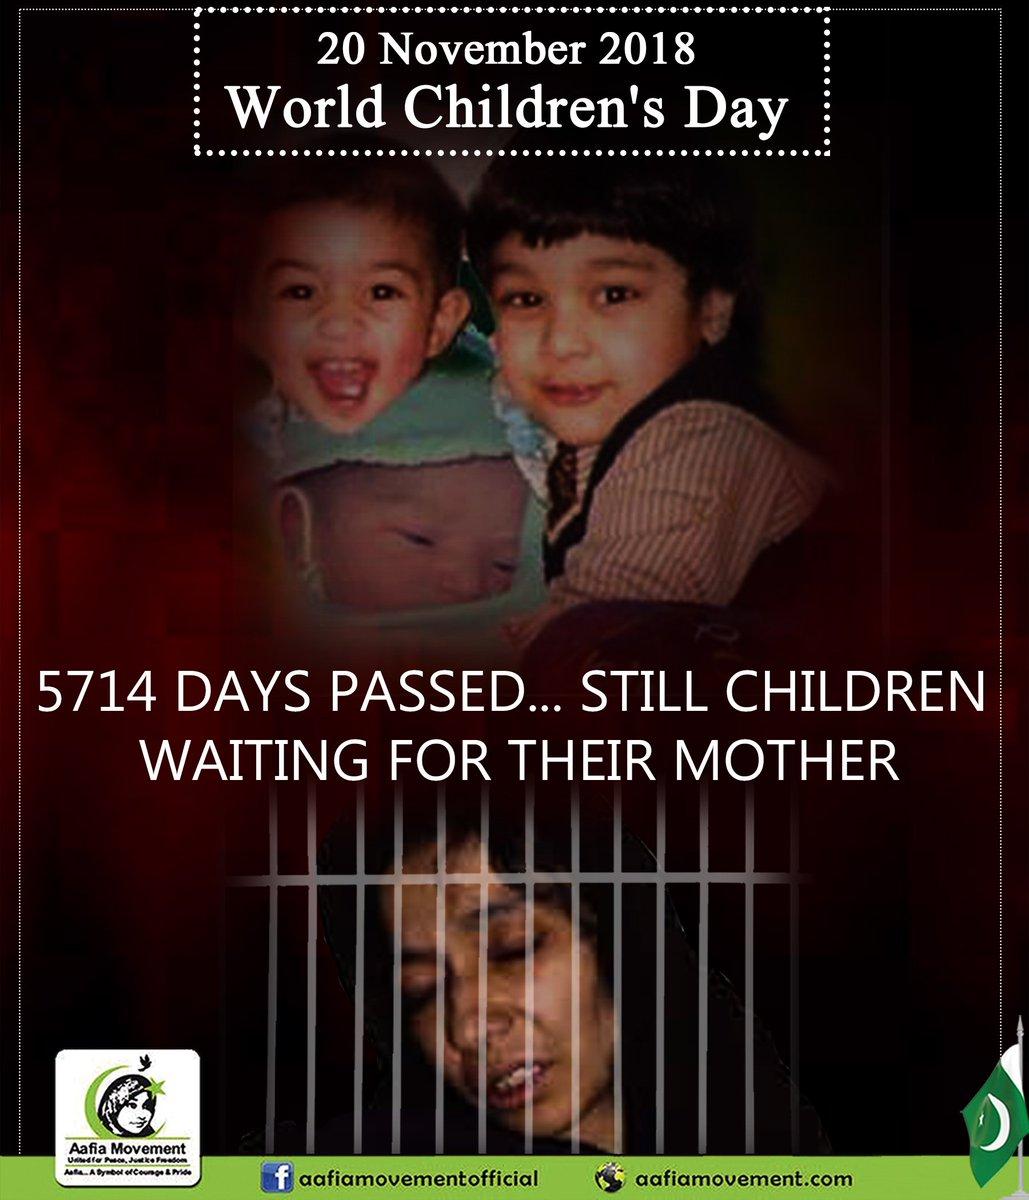 #FreeAafia #WorldChildrensDay